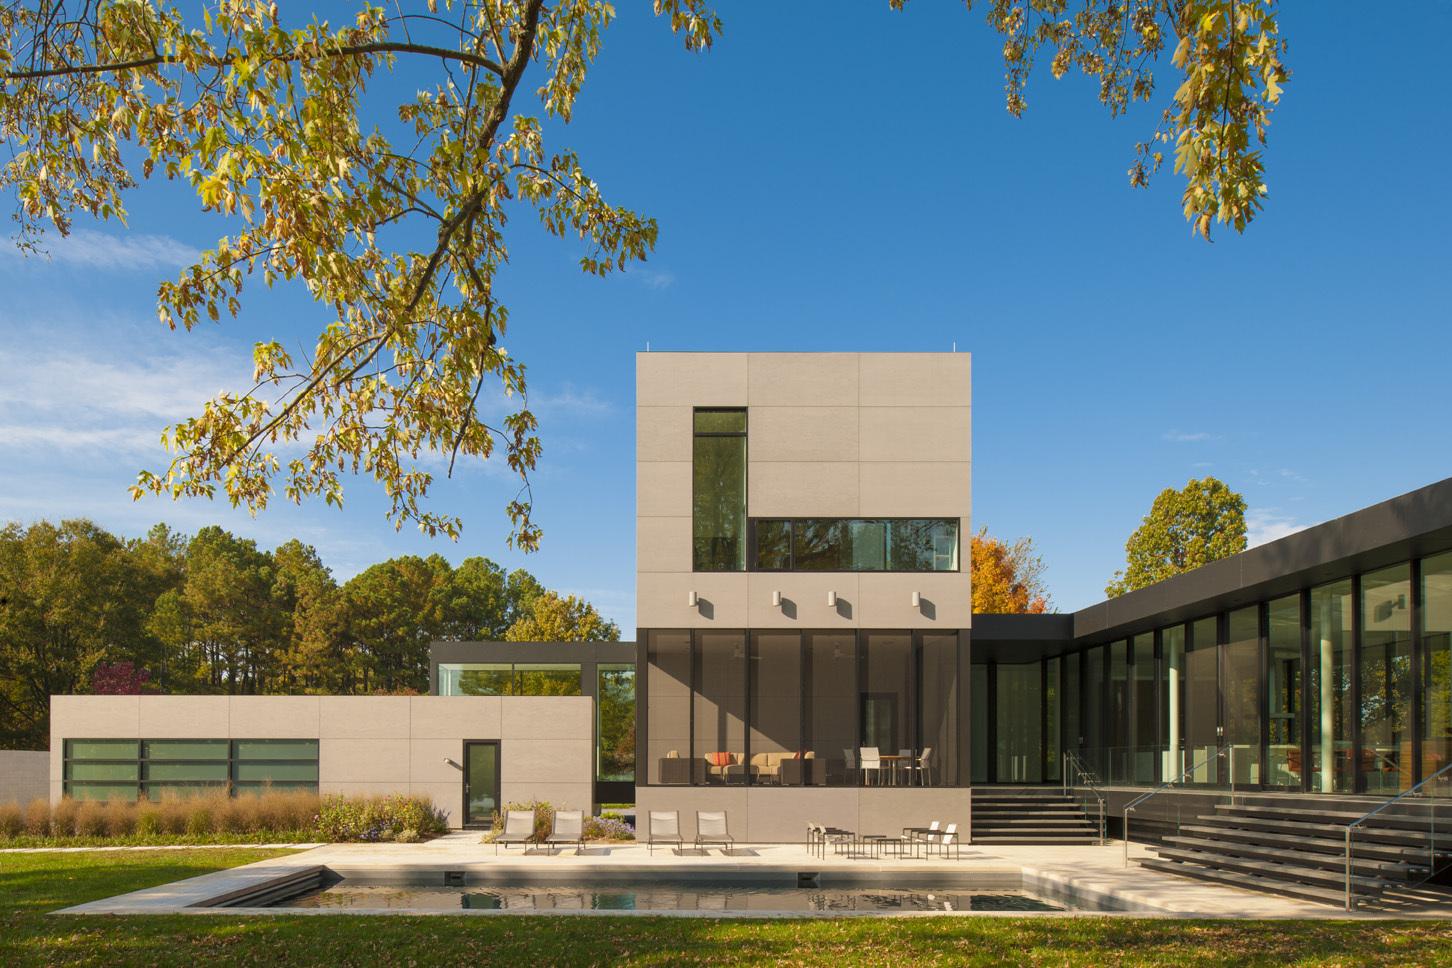 architecture as aesthetics tred avon river house robert m tred avon river house robert m gurney architect